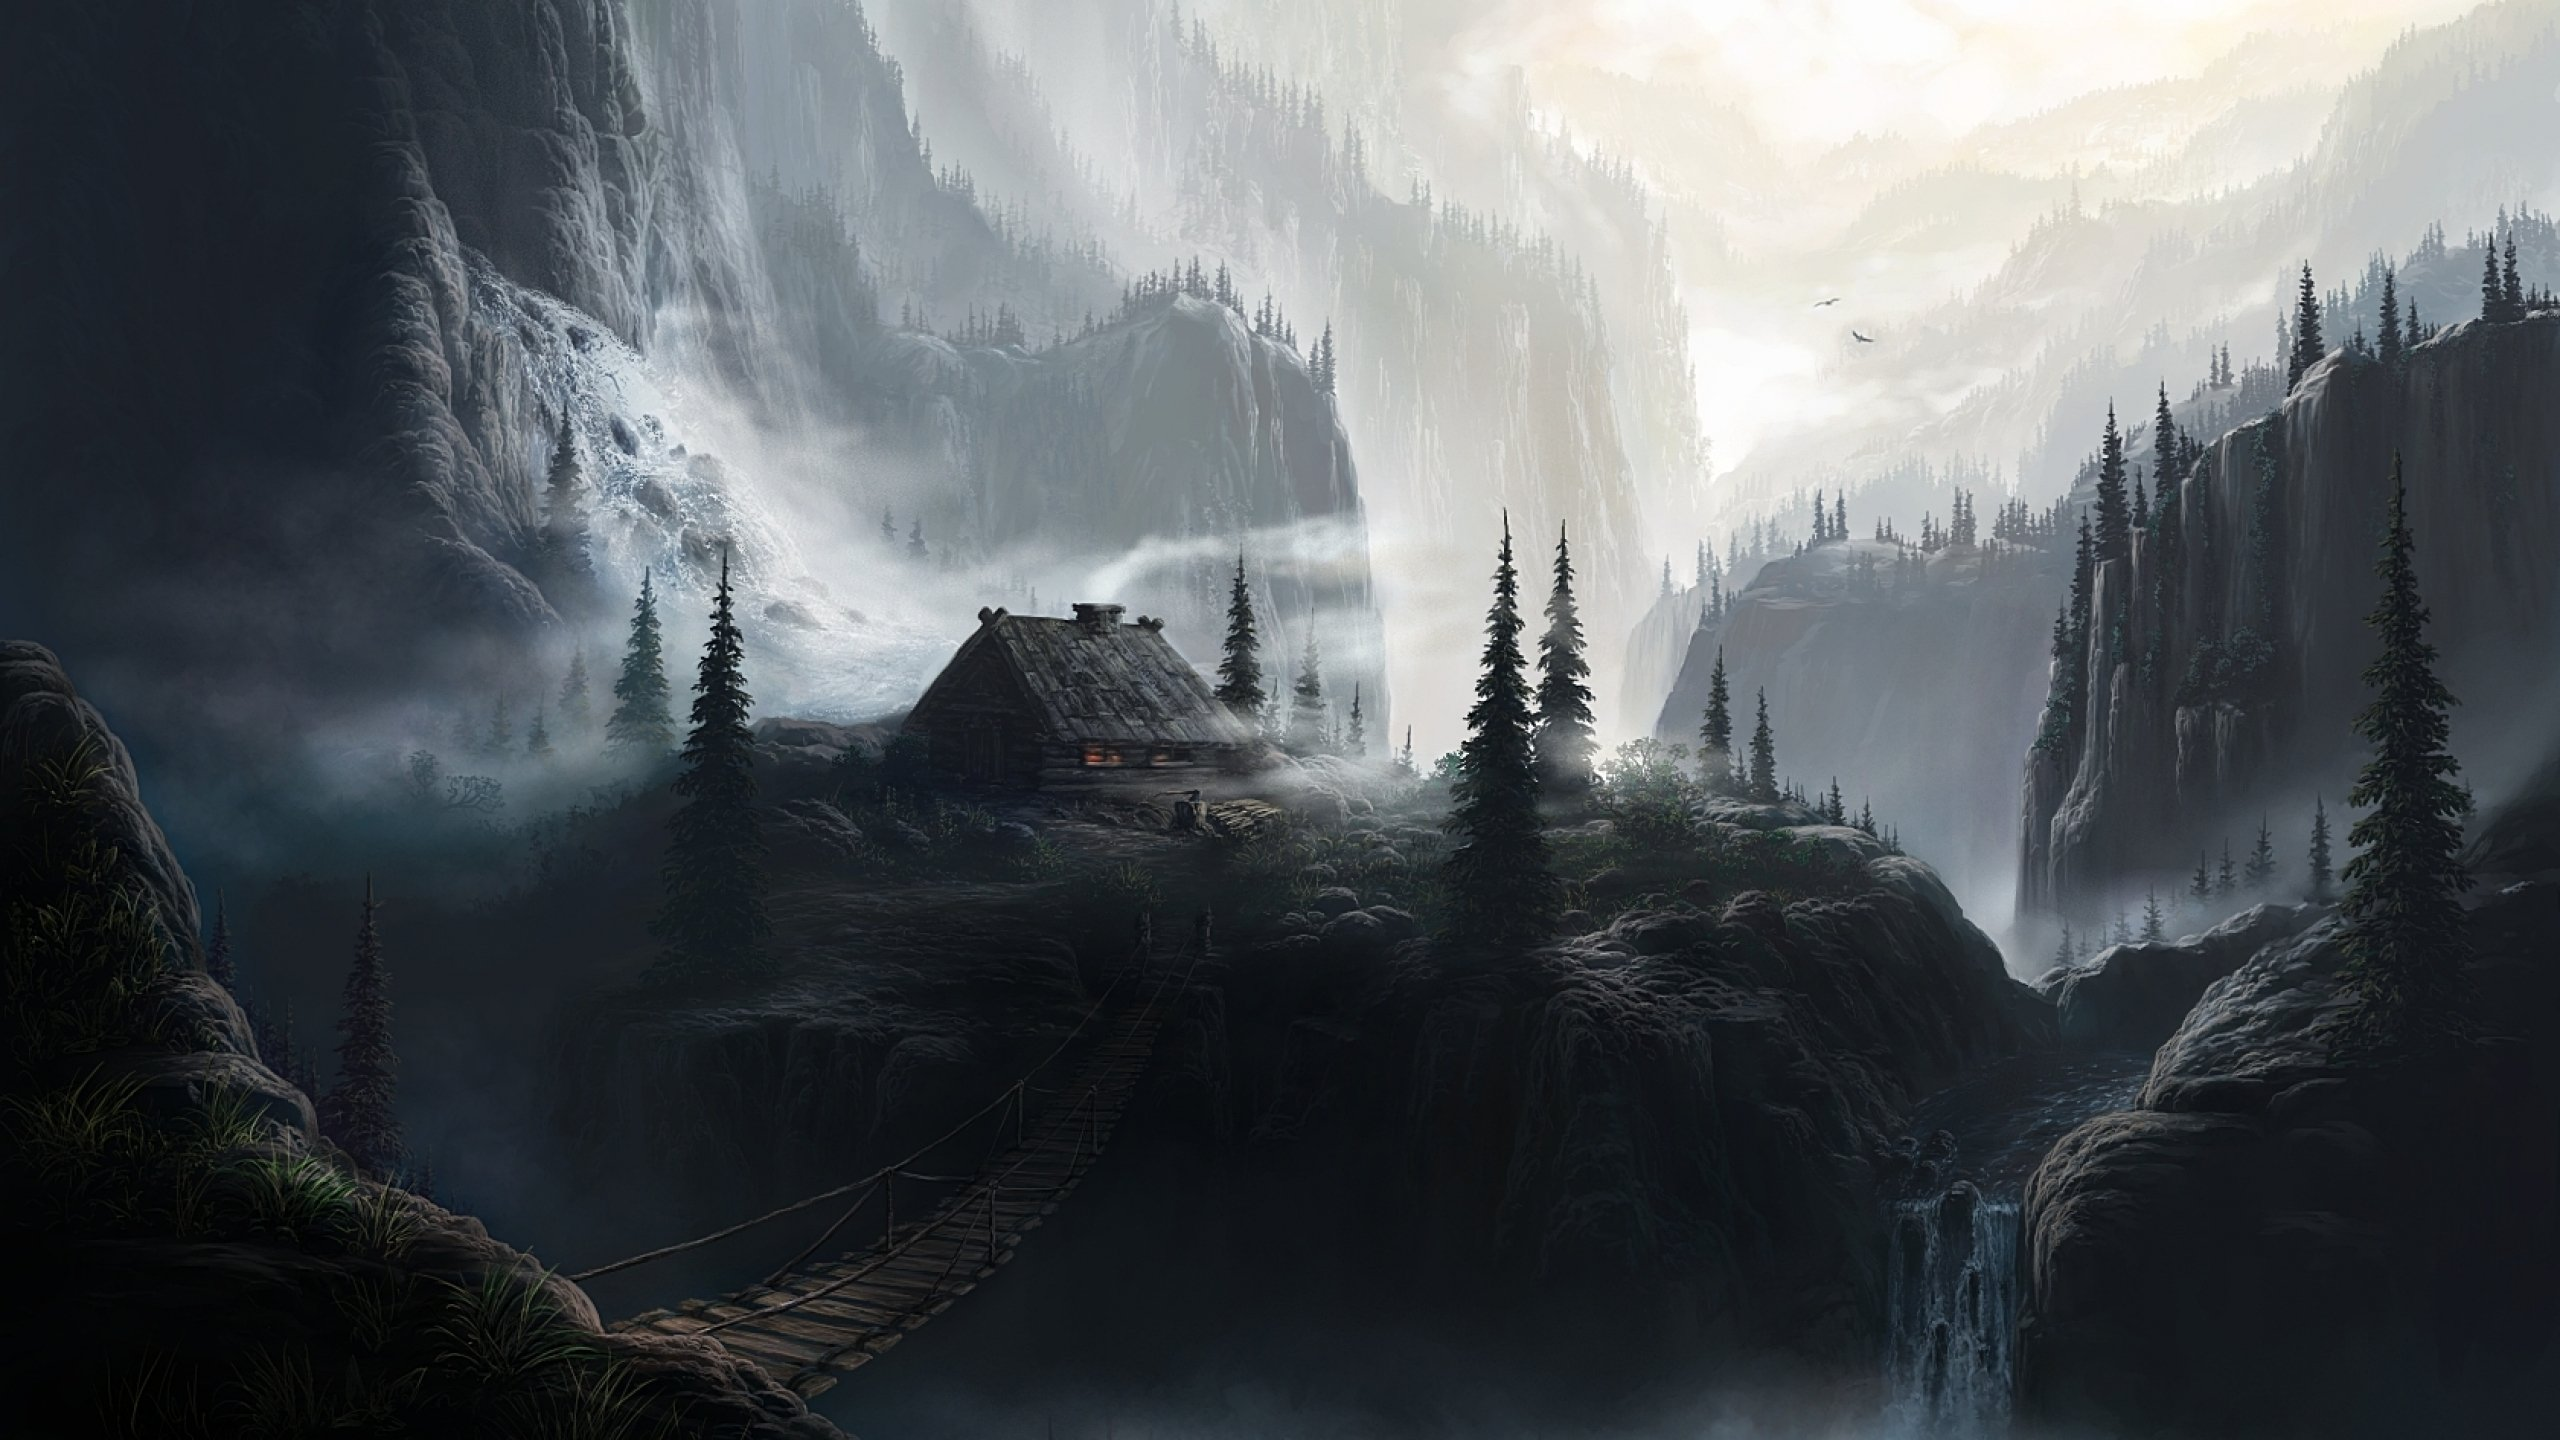 Fantasy Landscape Art Artwork Nature Wallpaper 2560x1440 667358 Wallpaperup